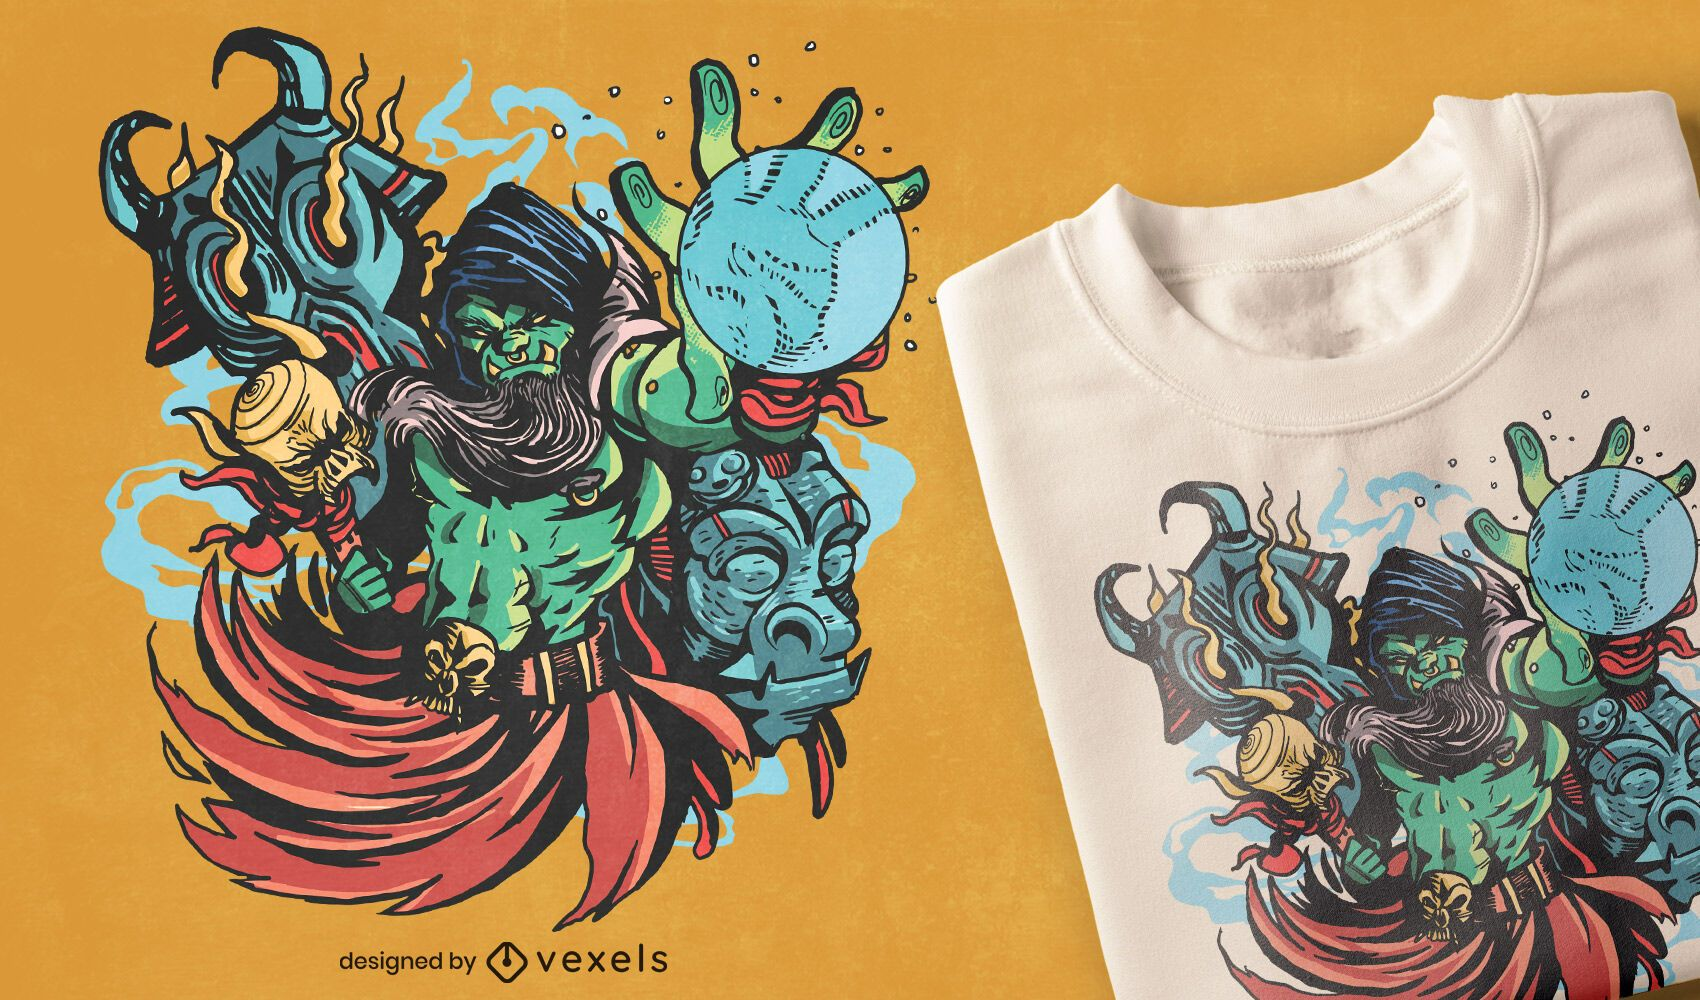 Ork Chaman Fantasie T-Shirt Design